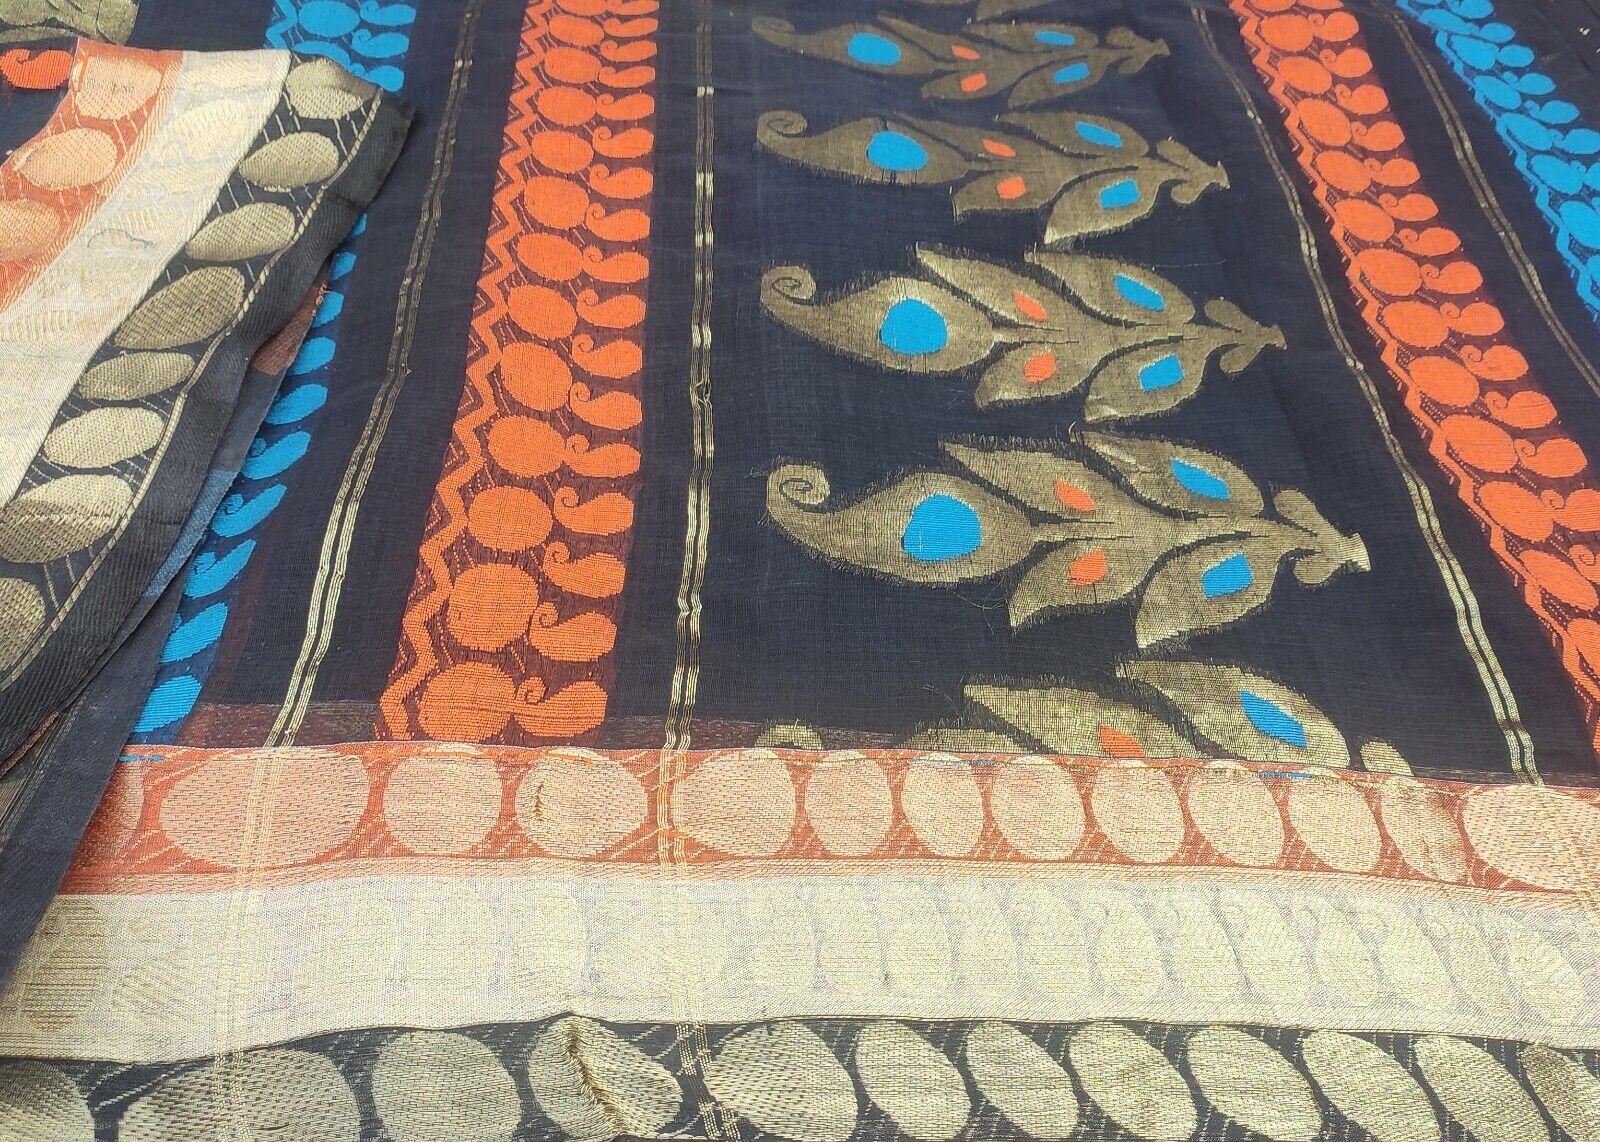 Dev Vintage Black Saree Cotton Woven Brocade Craft Fabric Zari Work Sari